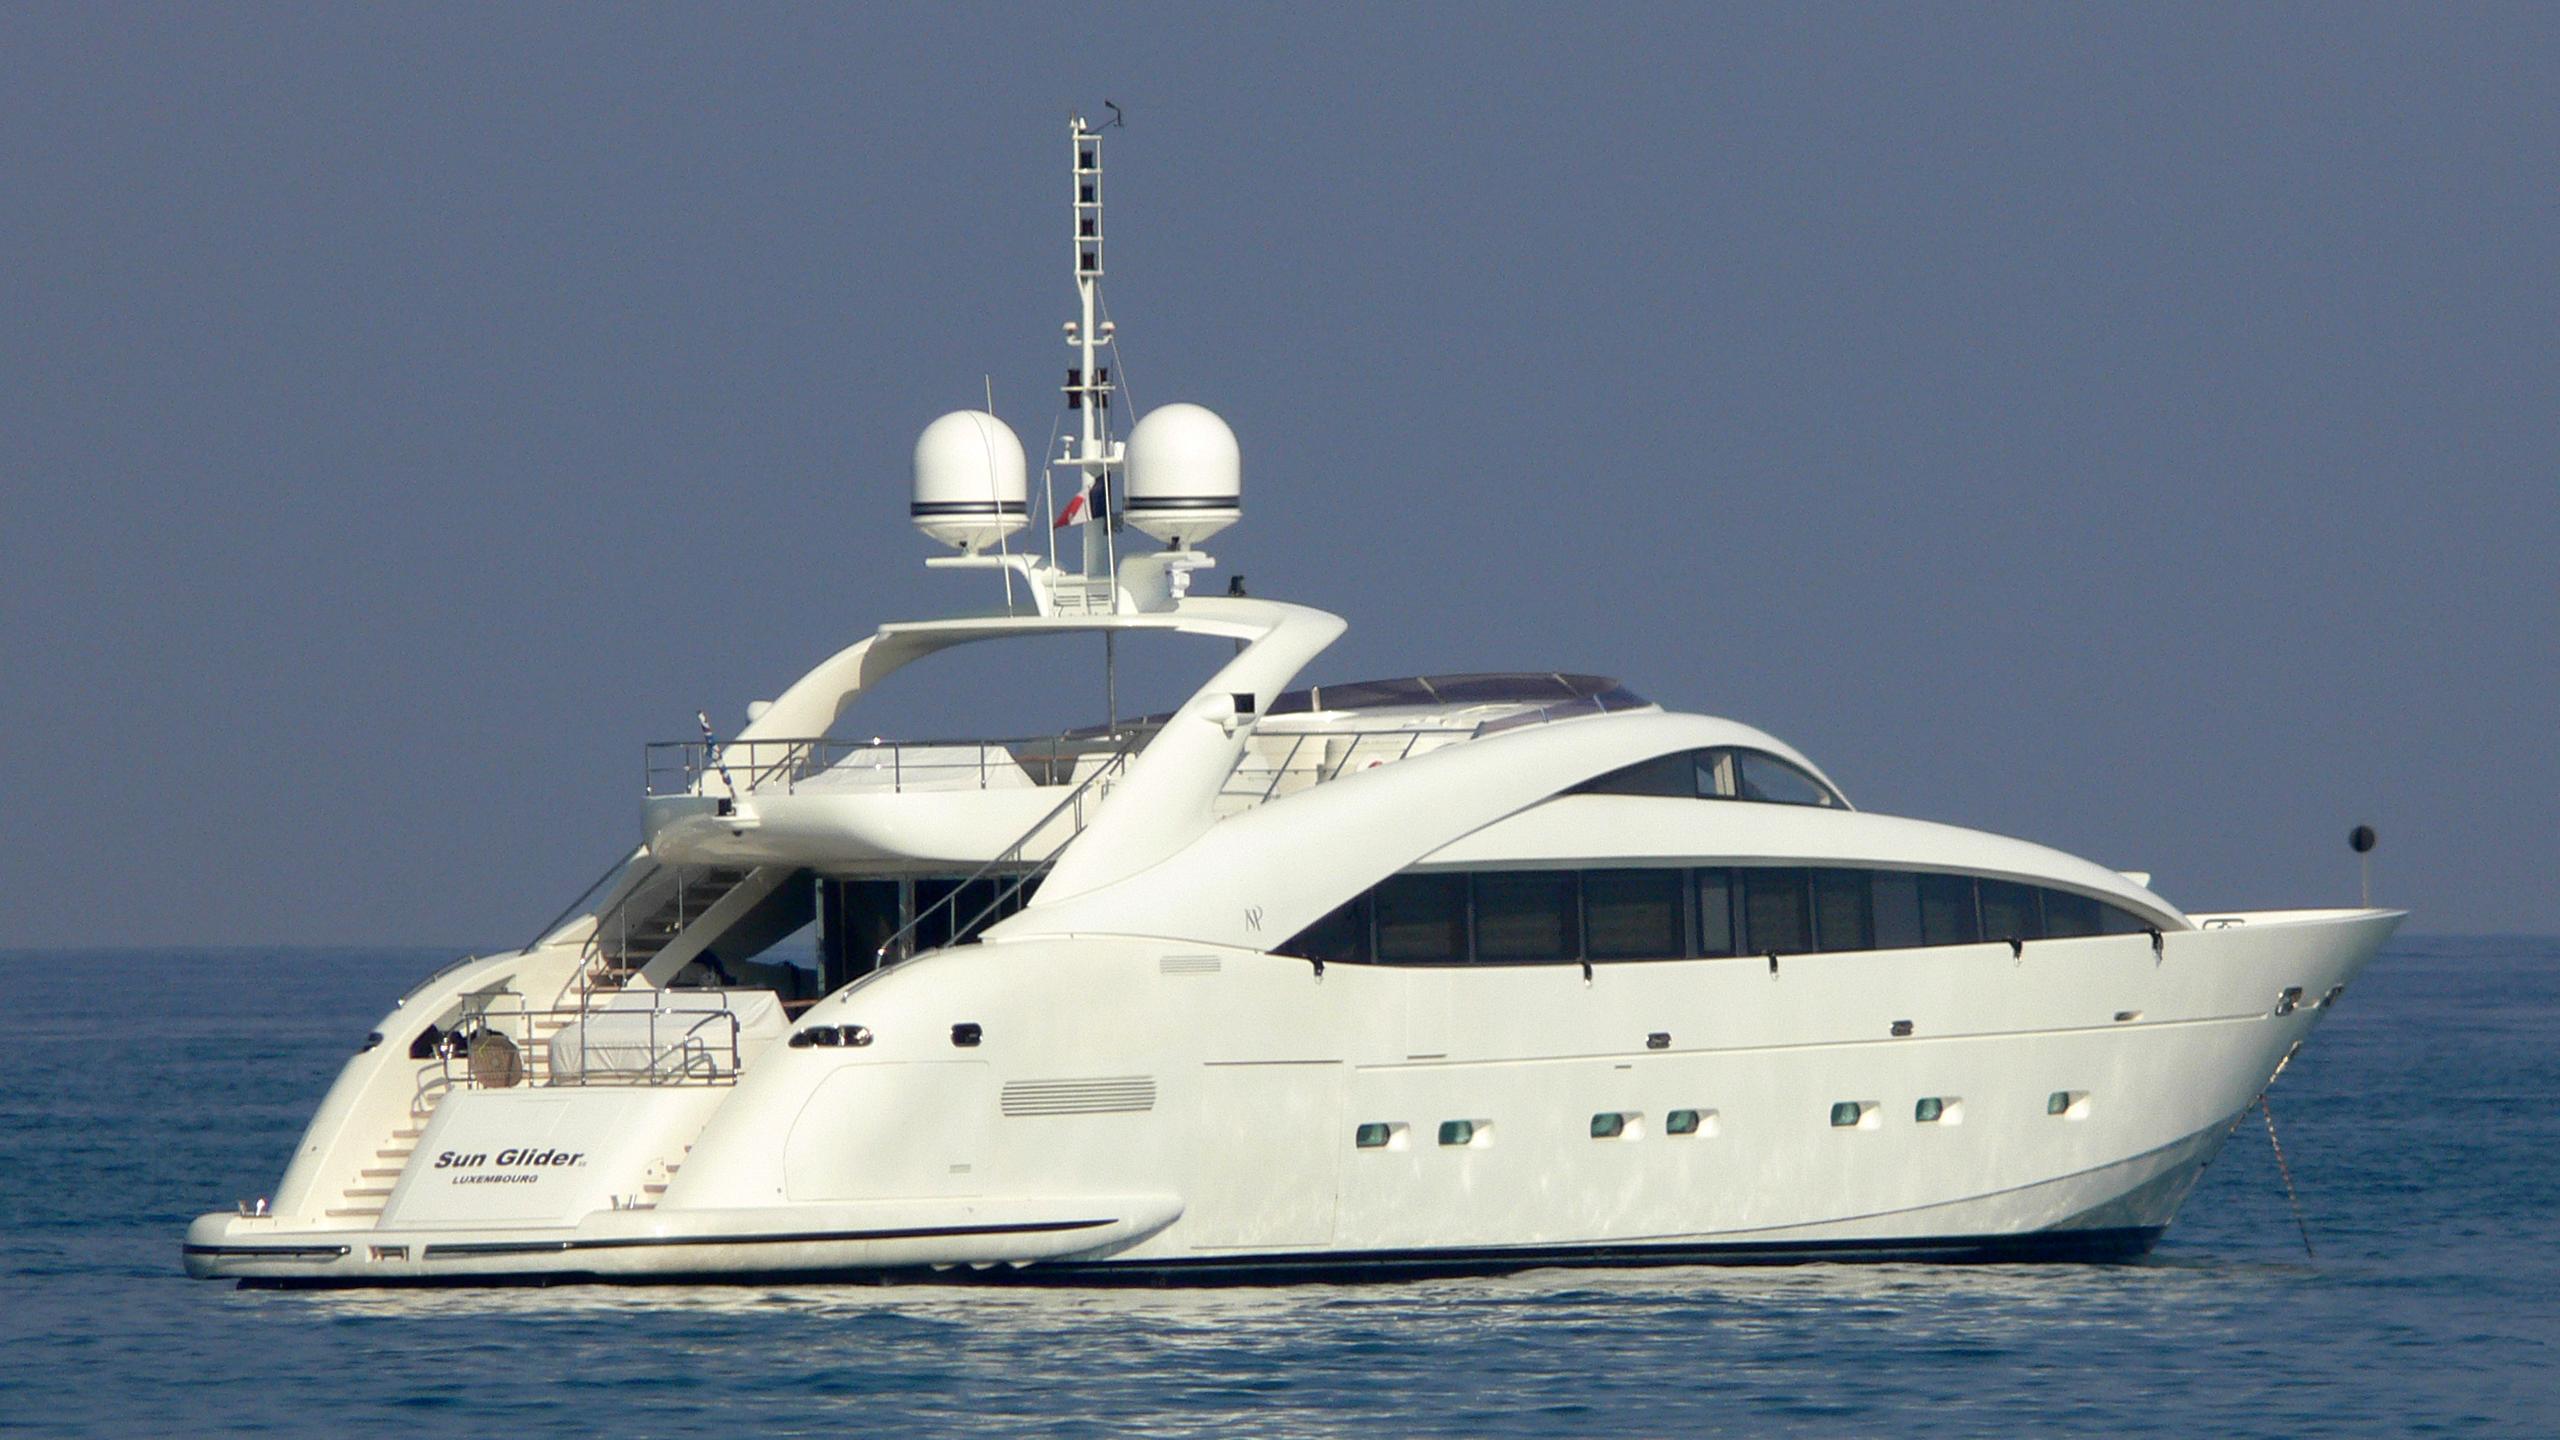 sun-gilder-ii-yacht-exterior